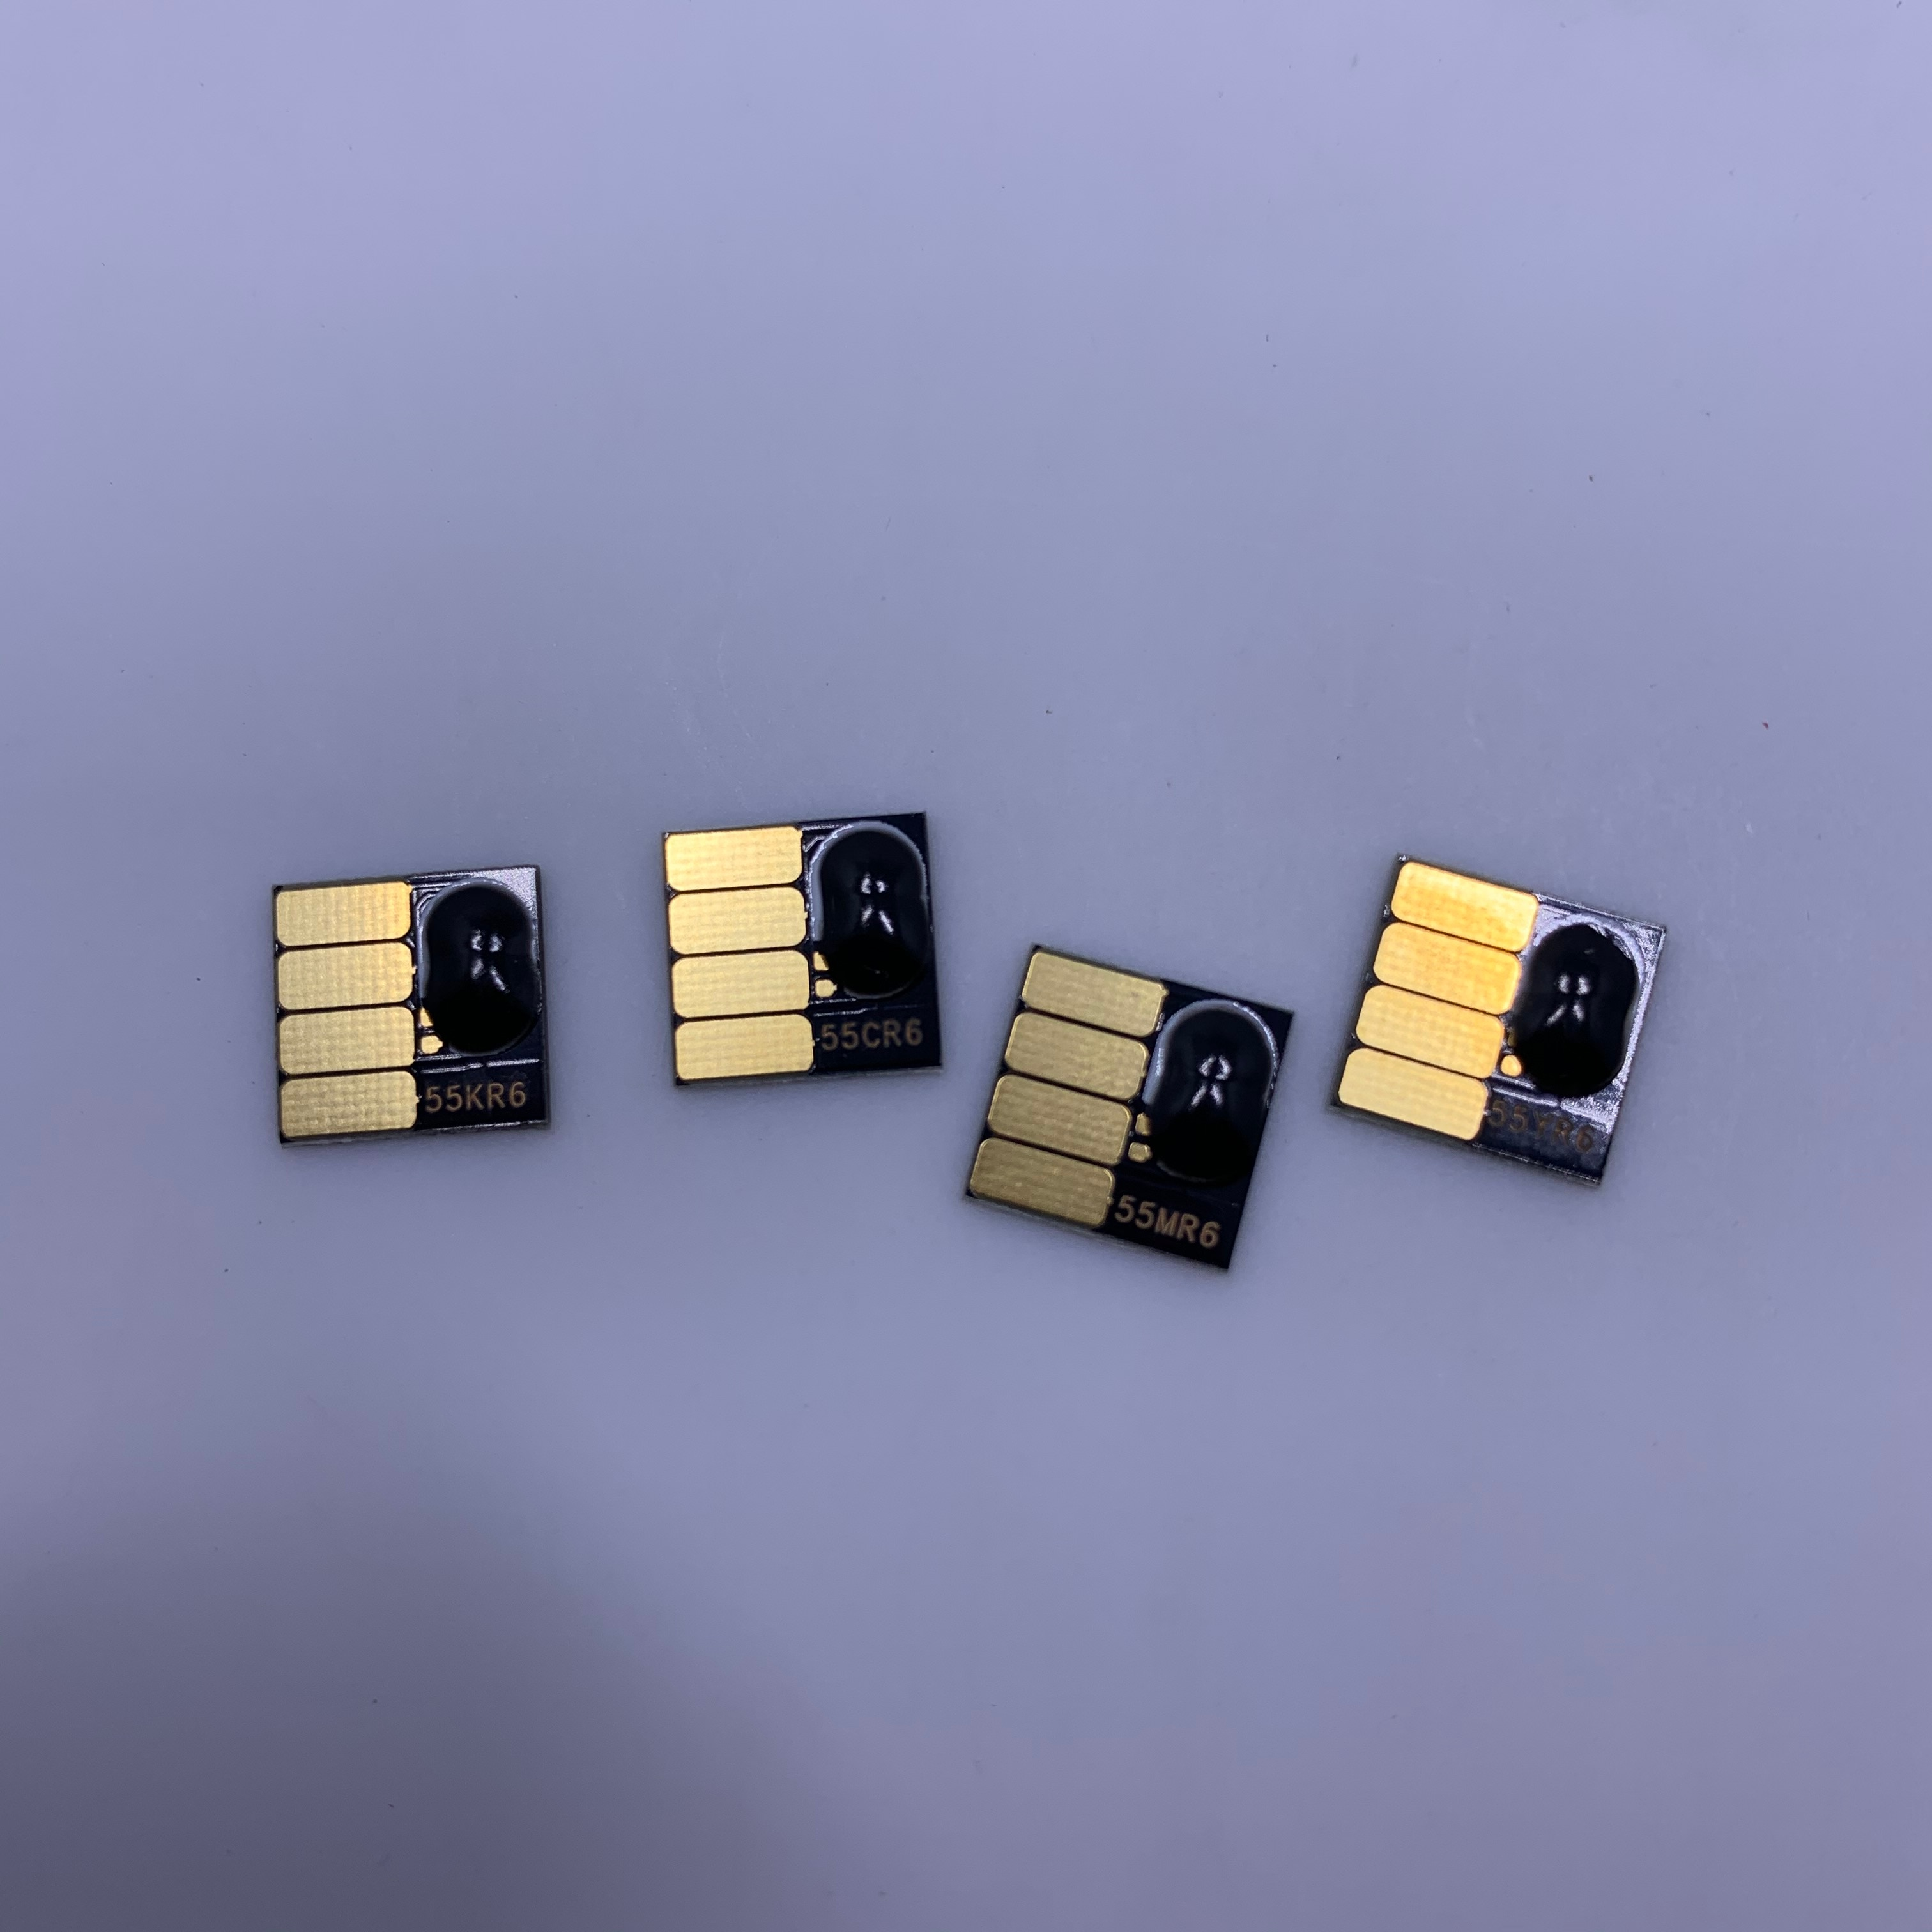 Chip ARC para HP955XL HP955 YOTAT para HP Officejet Pro 8216 8710 8720 8210 8702 8218 8715 8716 8717 8725 8727 printer